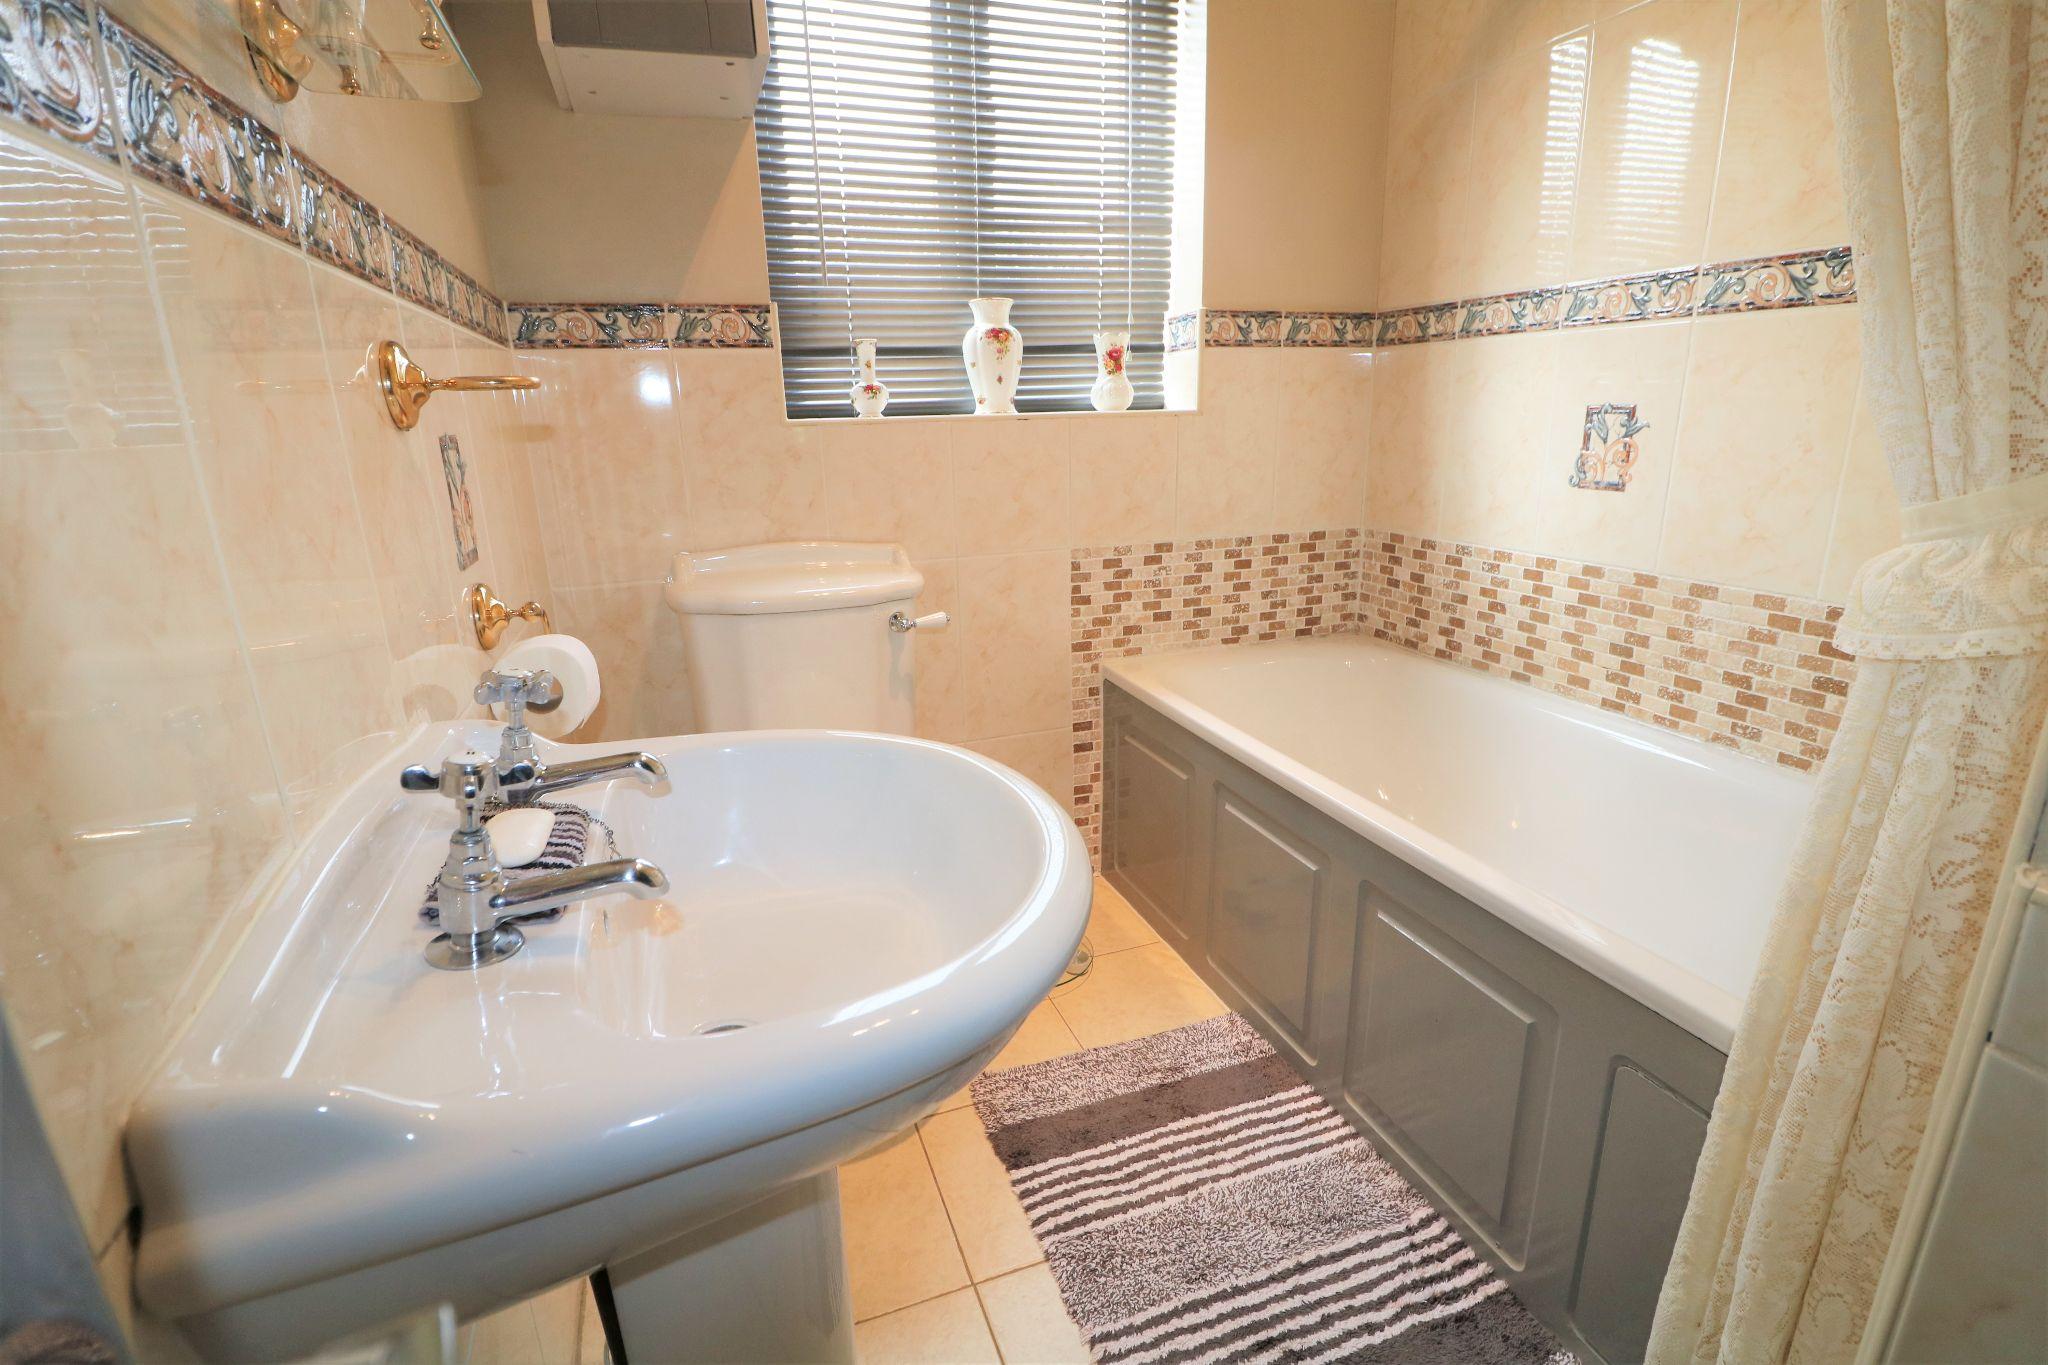 3 Bedroom Detached House For Sale - House Bathroom